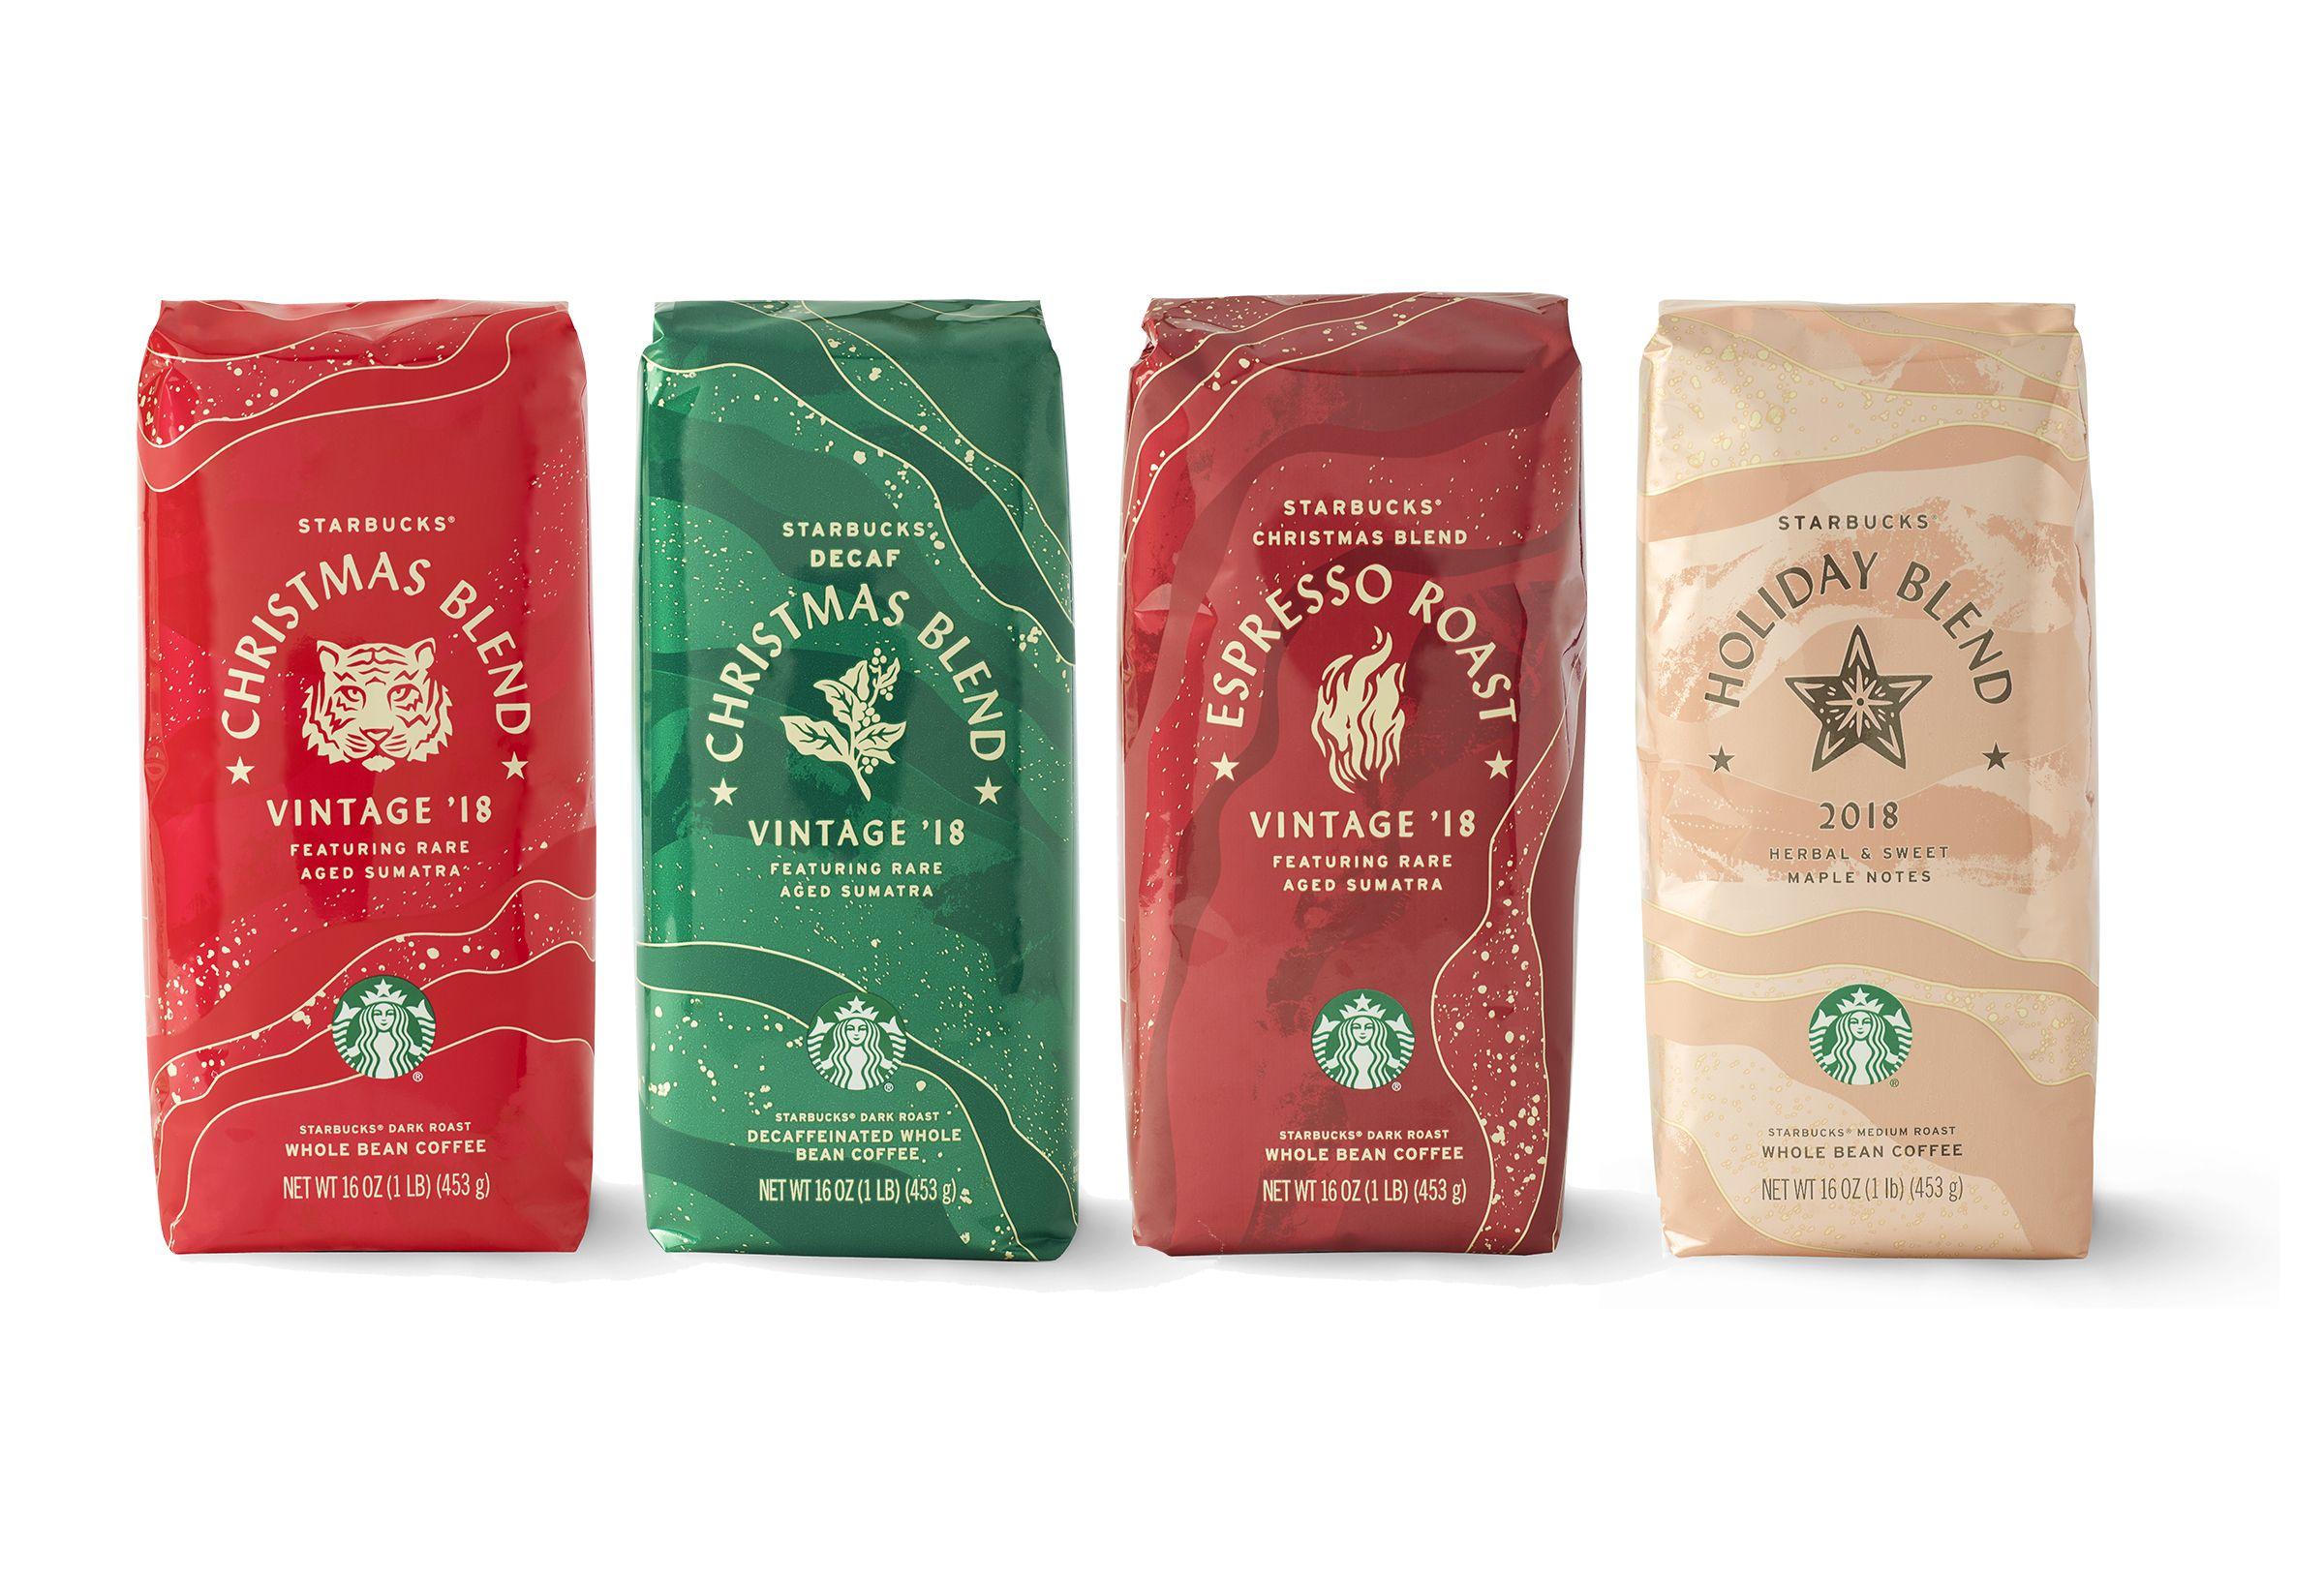 Pin by 家榛 黃 on pakege design Starbucks design, Starbucks